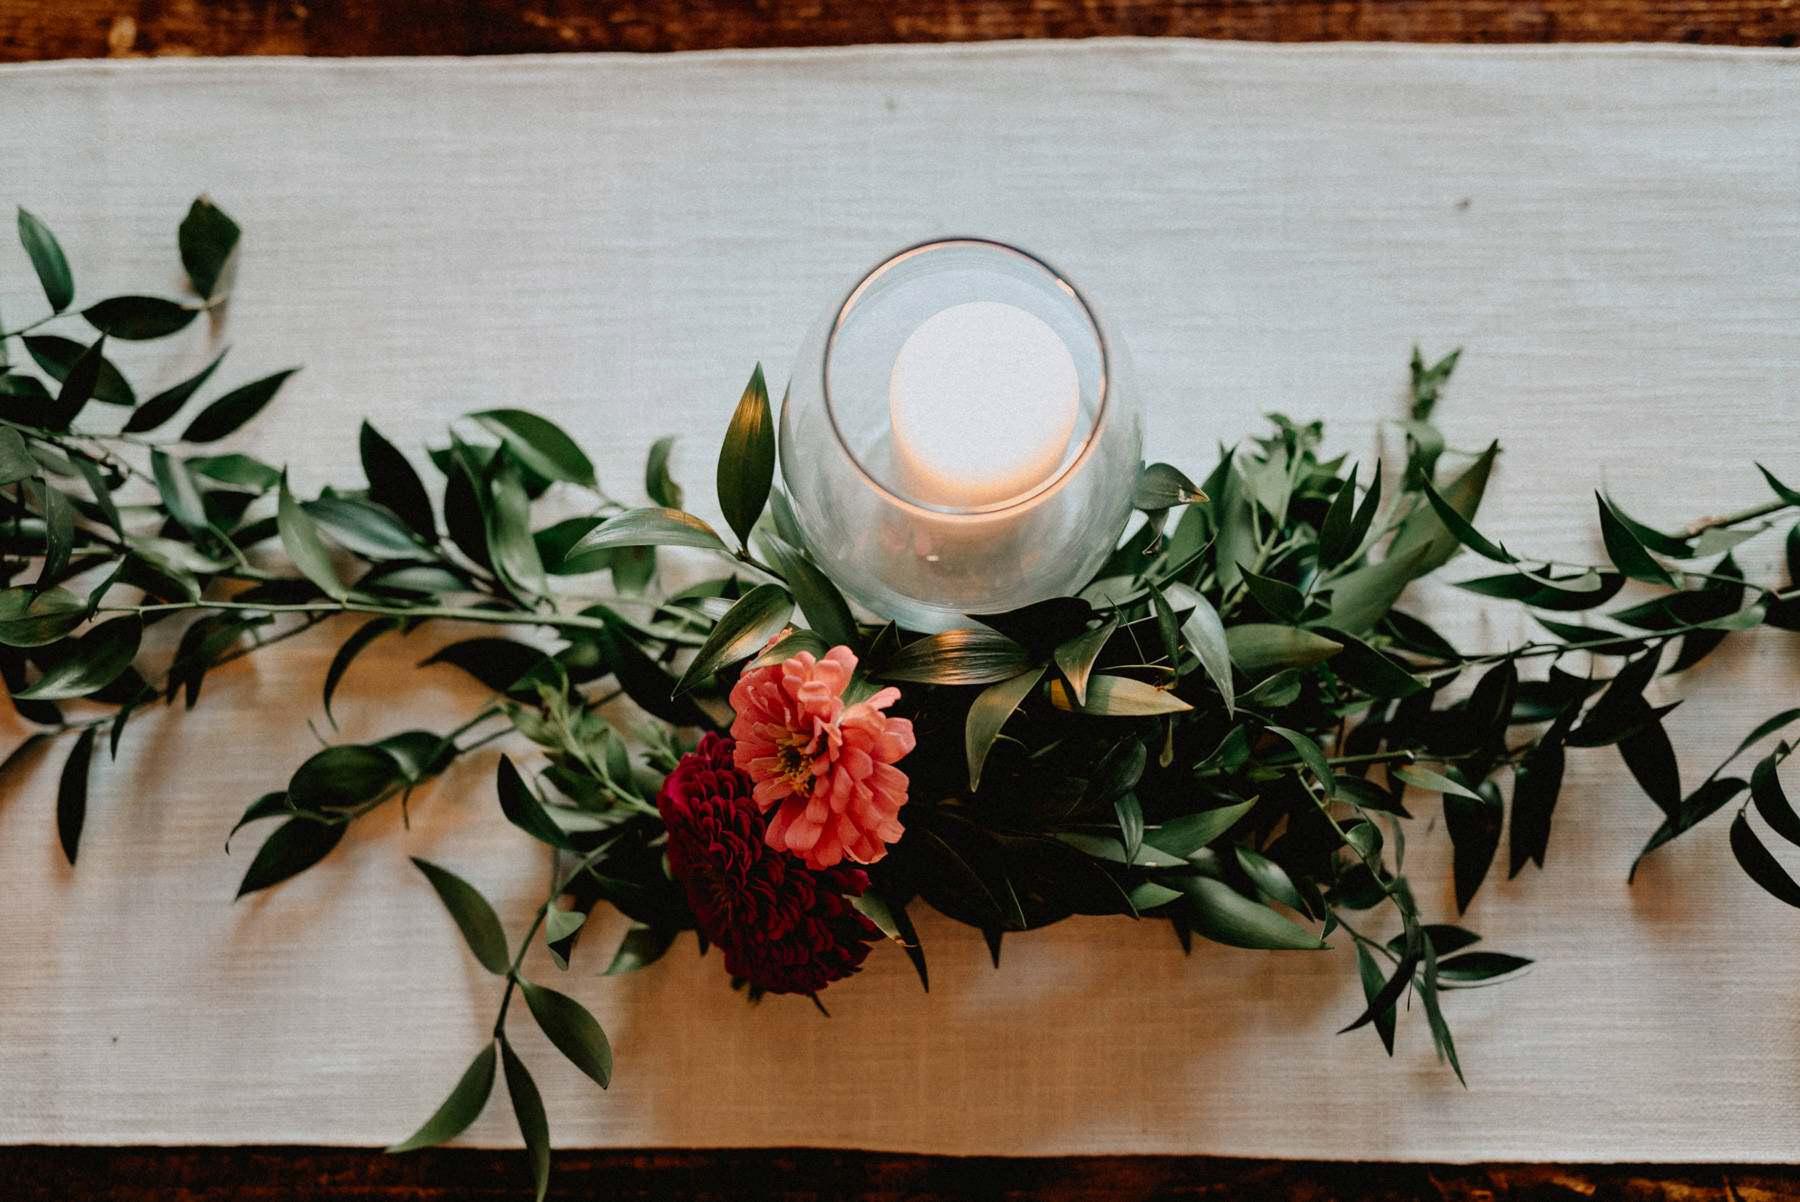 pennsylvania-private-estate-wedding-97.jpg